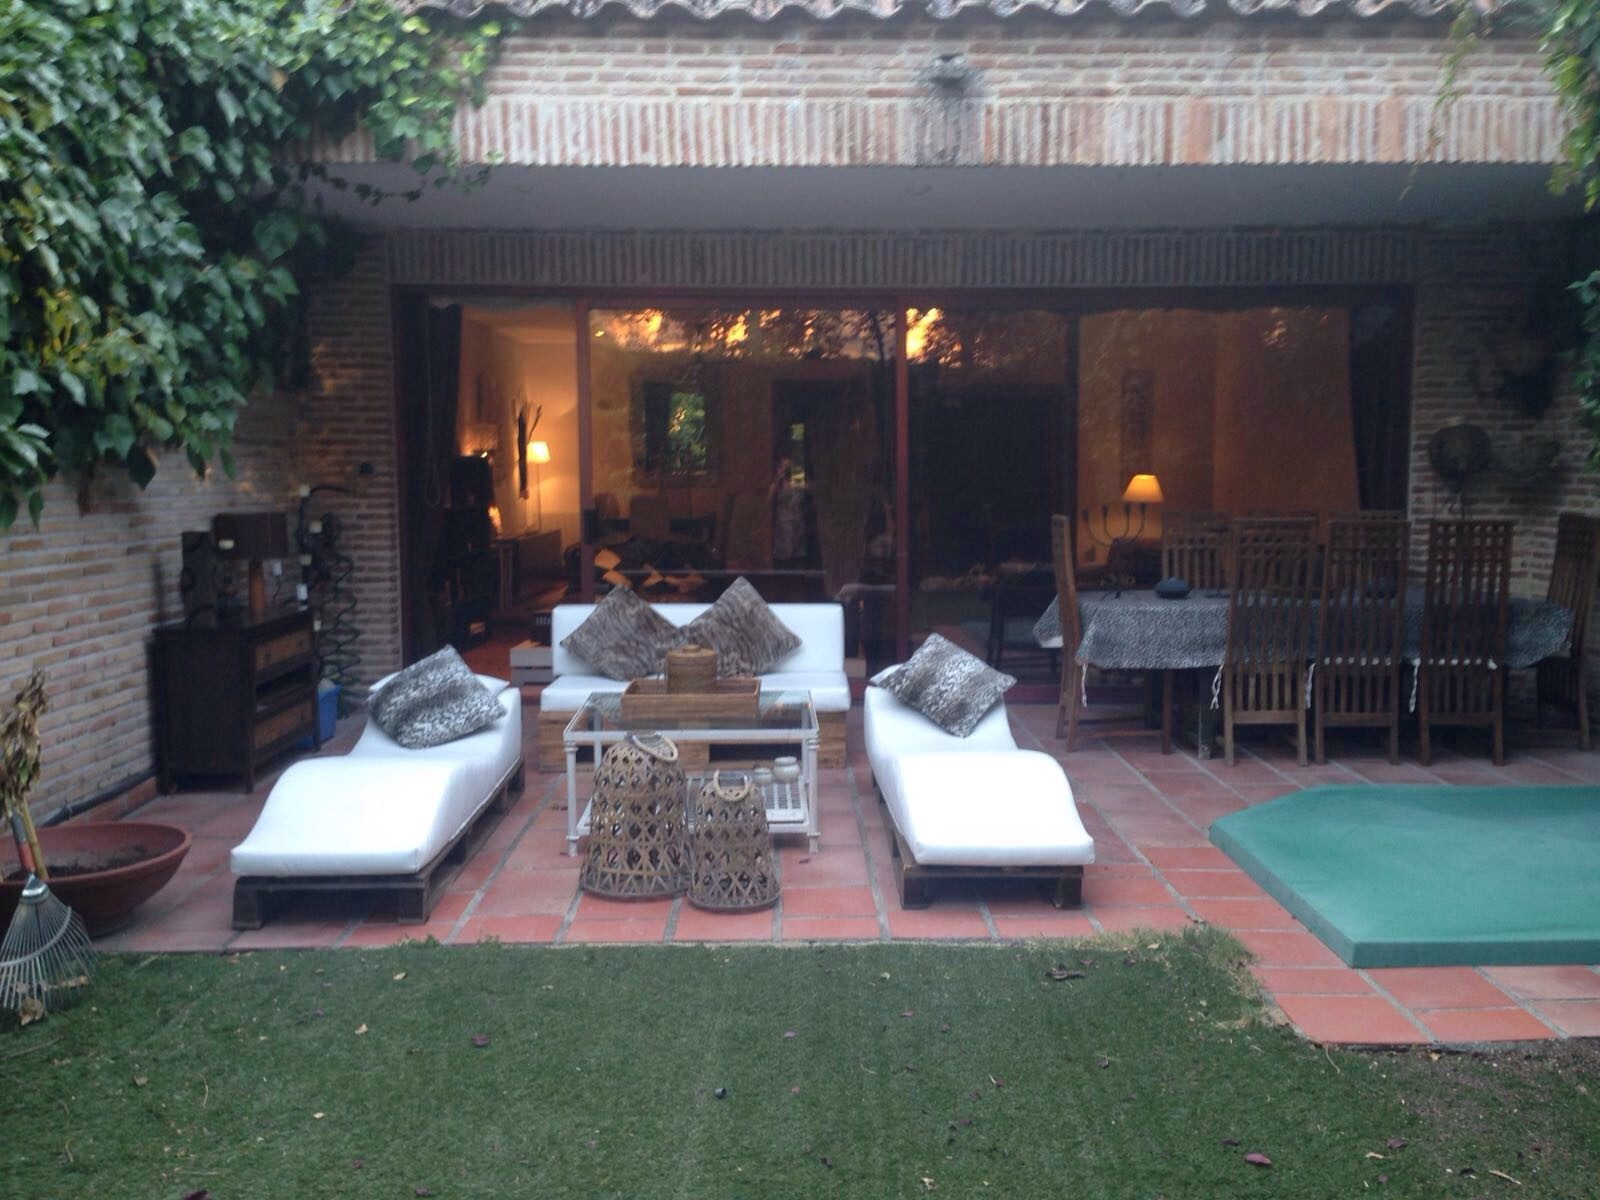 Buhardilla en precioso chalet adosado 3 piezas salon estudio peque o dormitorio ba o con - Piso compartido vitoria ...